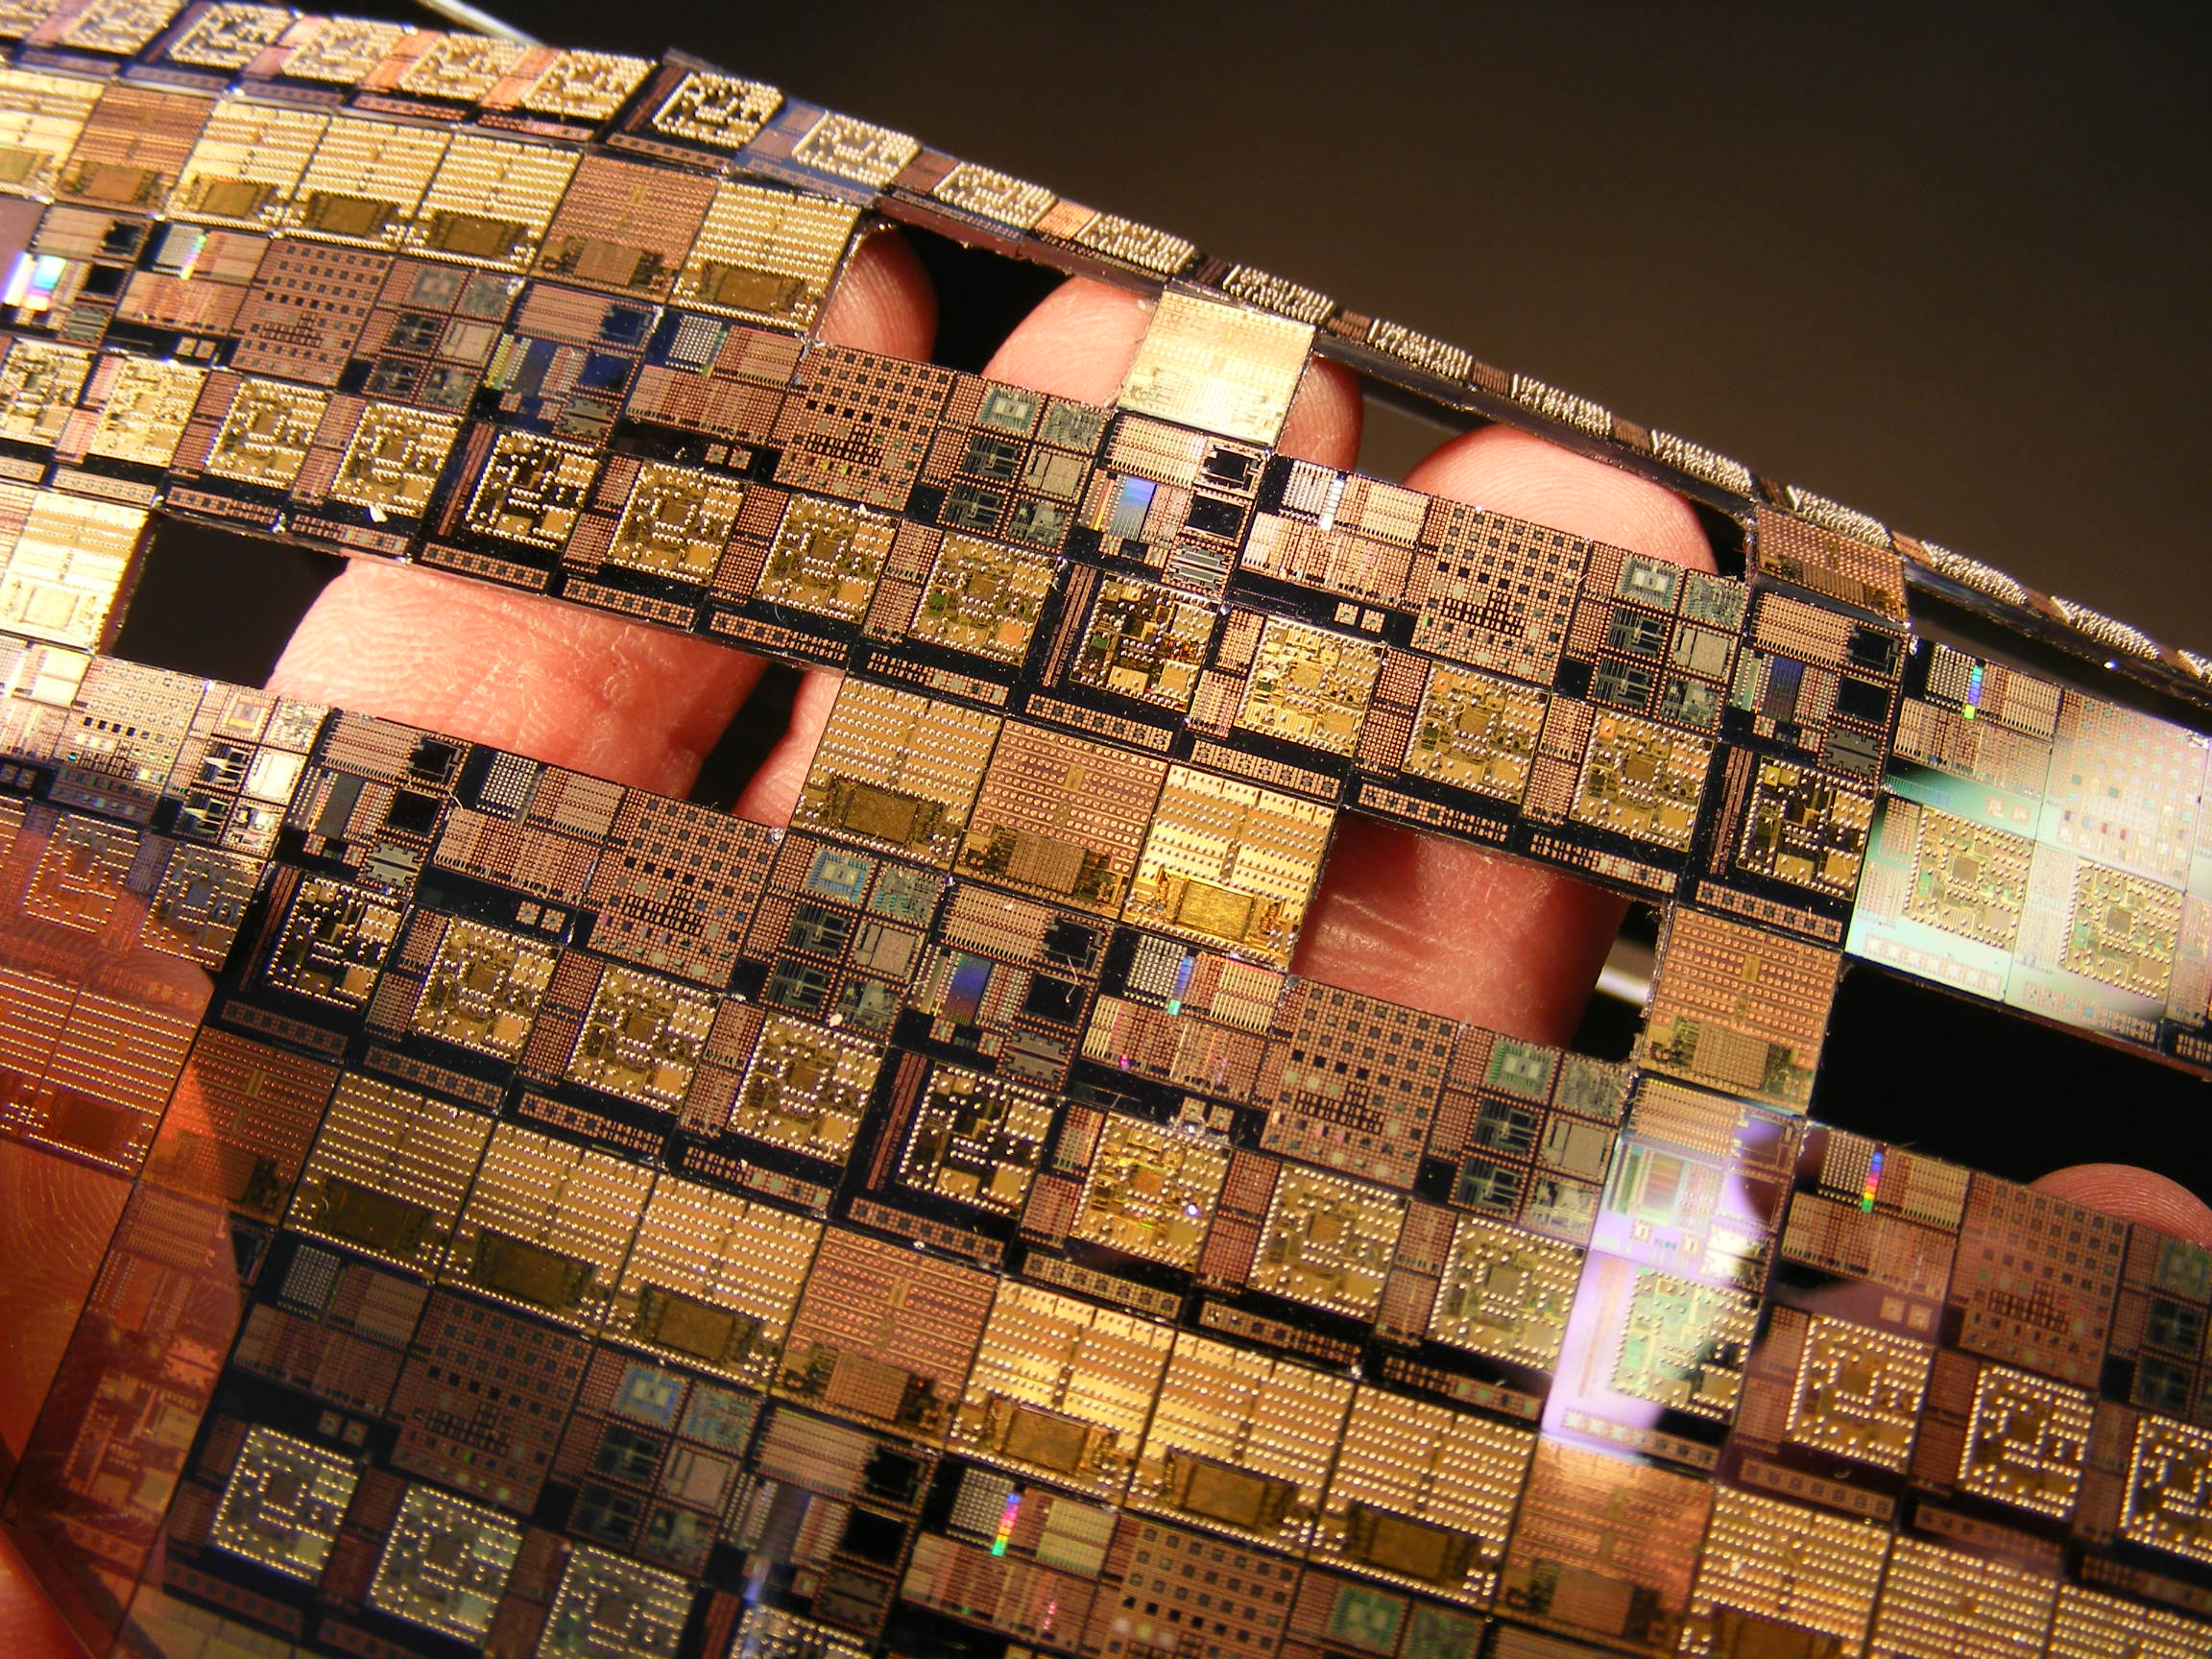 Silicon Wafers - CPU Artworks